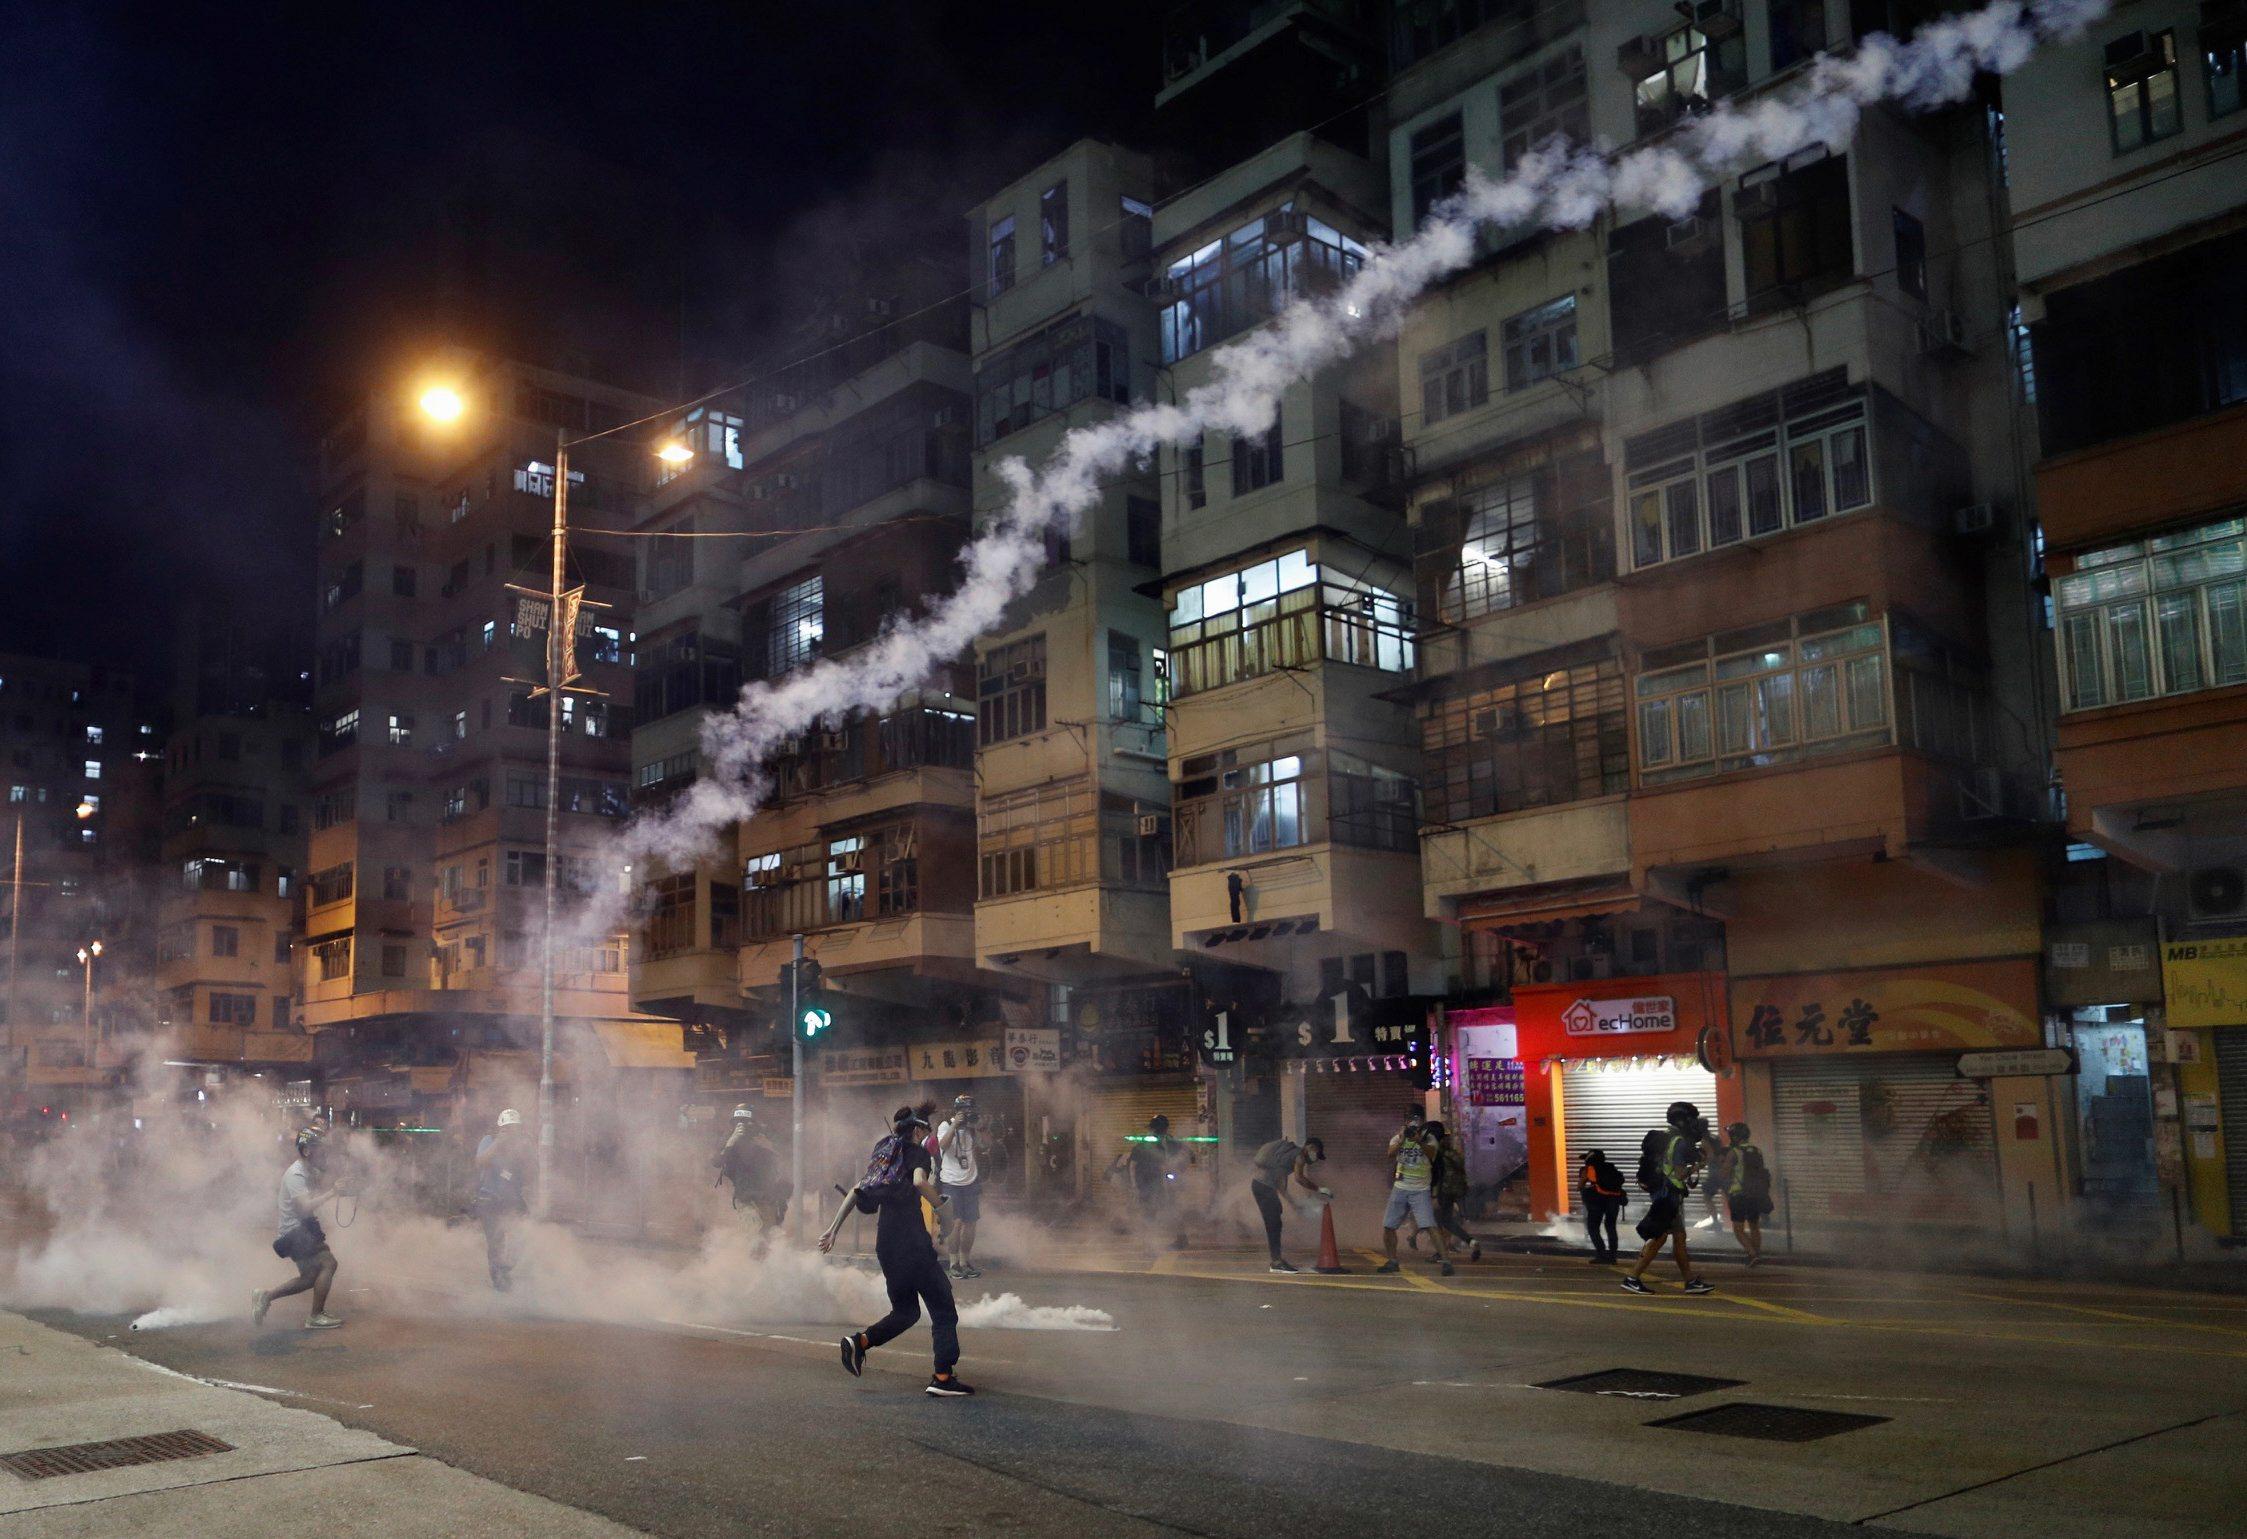 'Internal matter': Trump treads lightly on China amid Hong Kong tensions